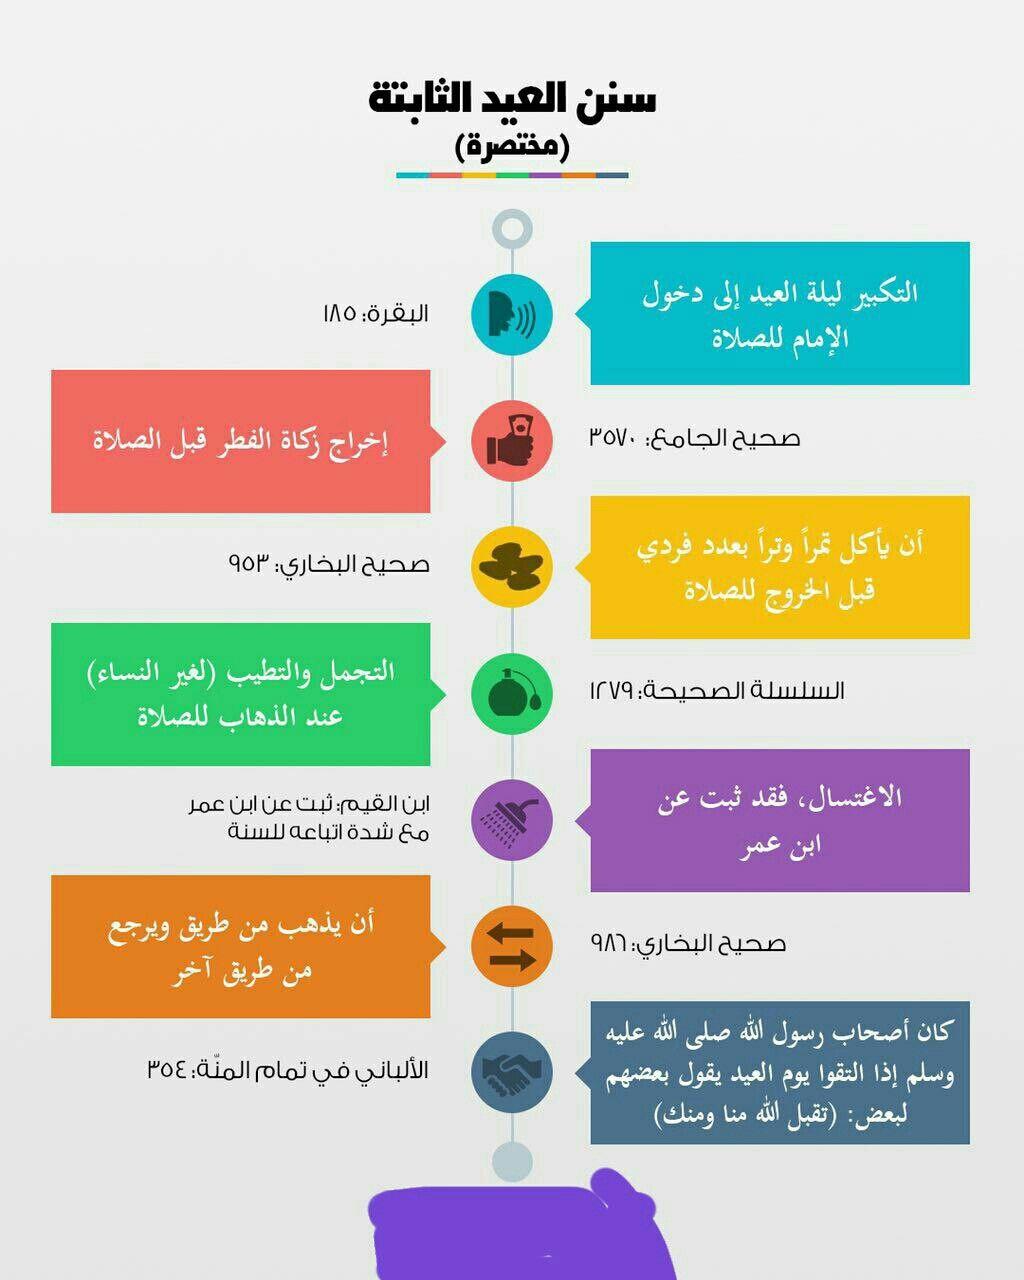 Pin By Nor Elhoda On رمضان مبارك Infographic